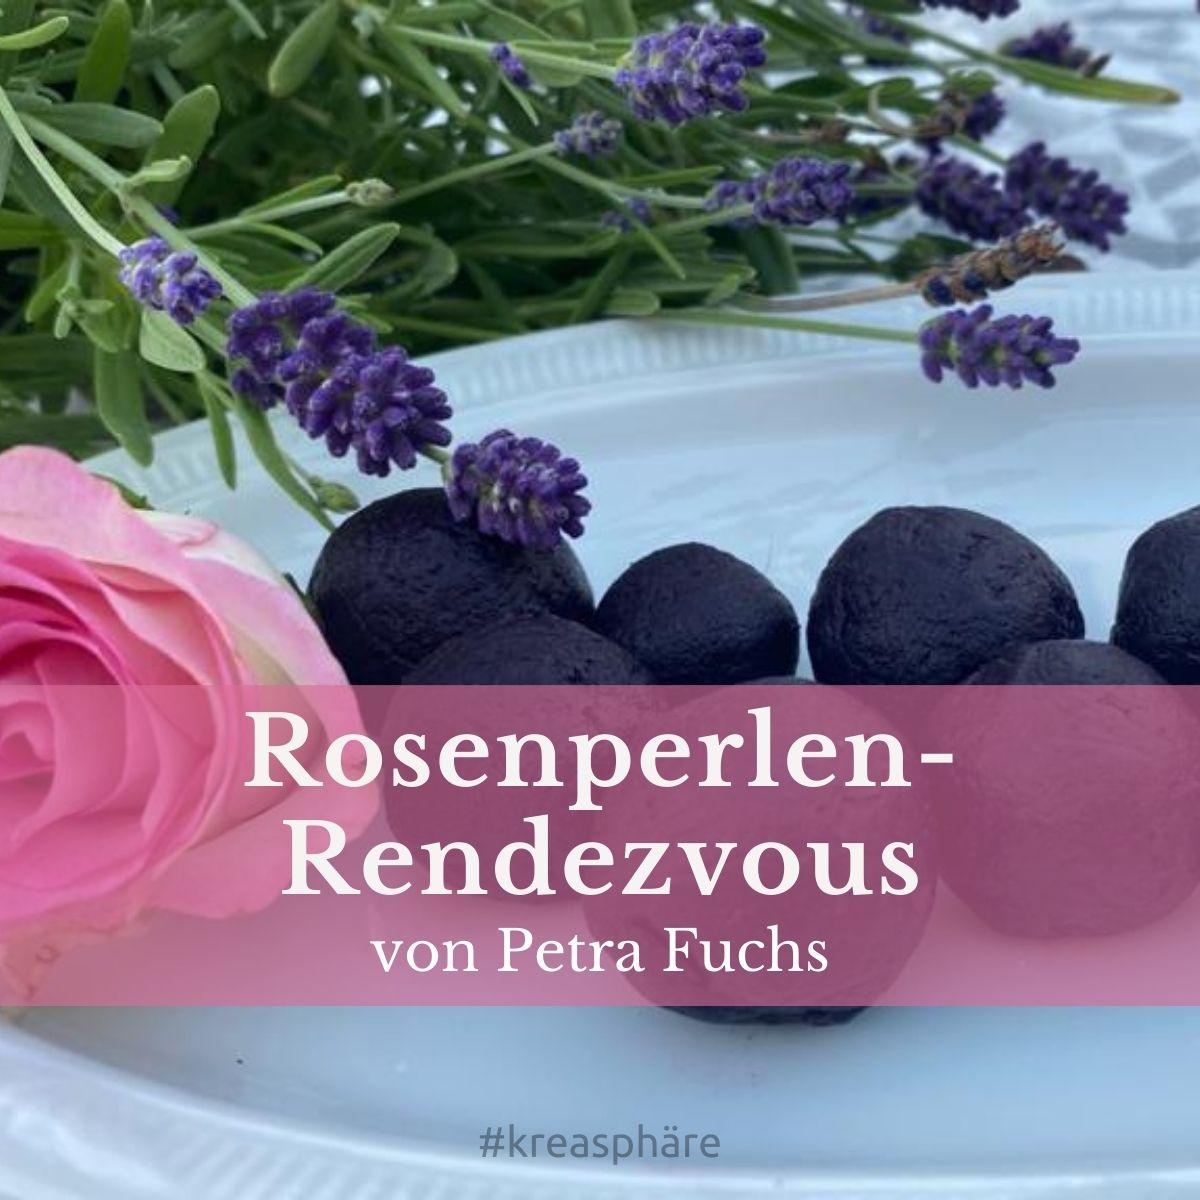 Rosenperlen-Rendezvous mit Petra Sila Fuchs